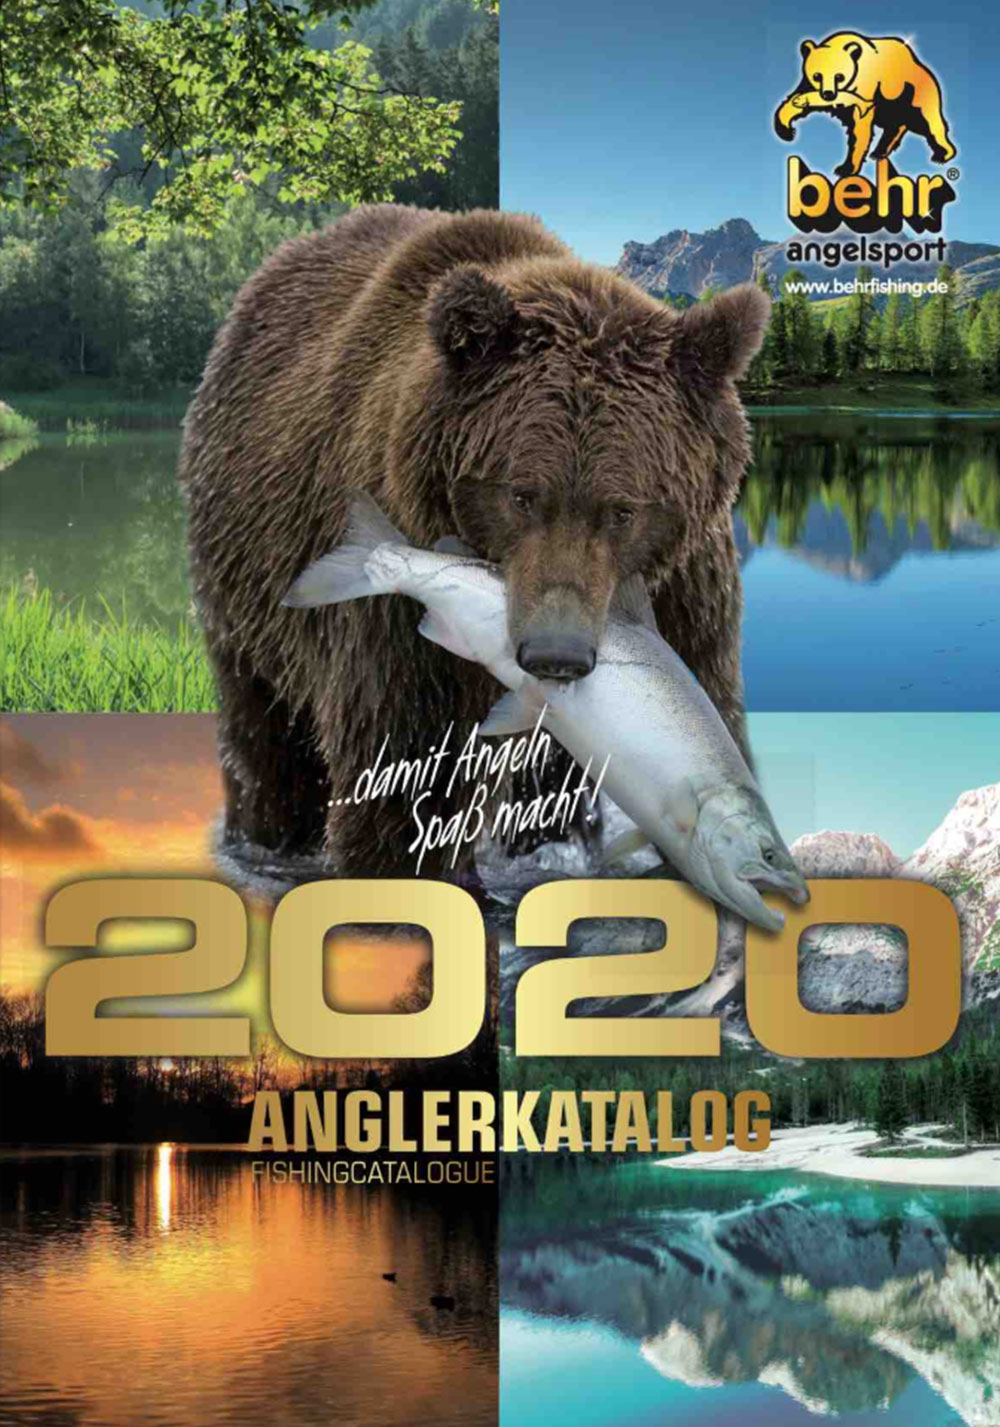 Behr Katalog 2020